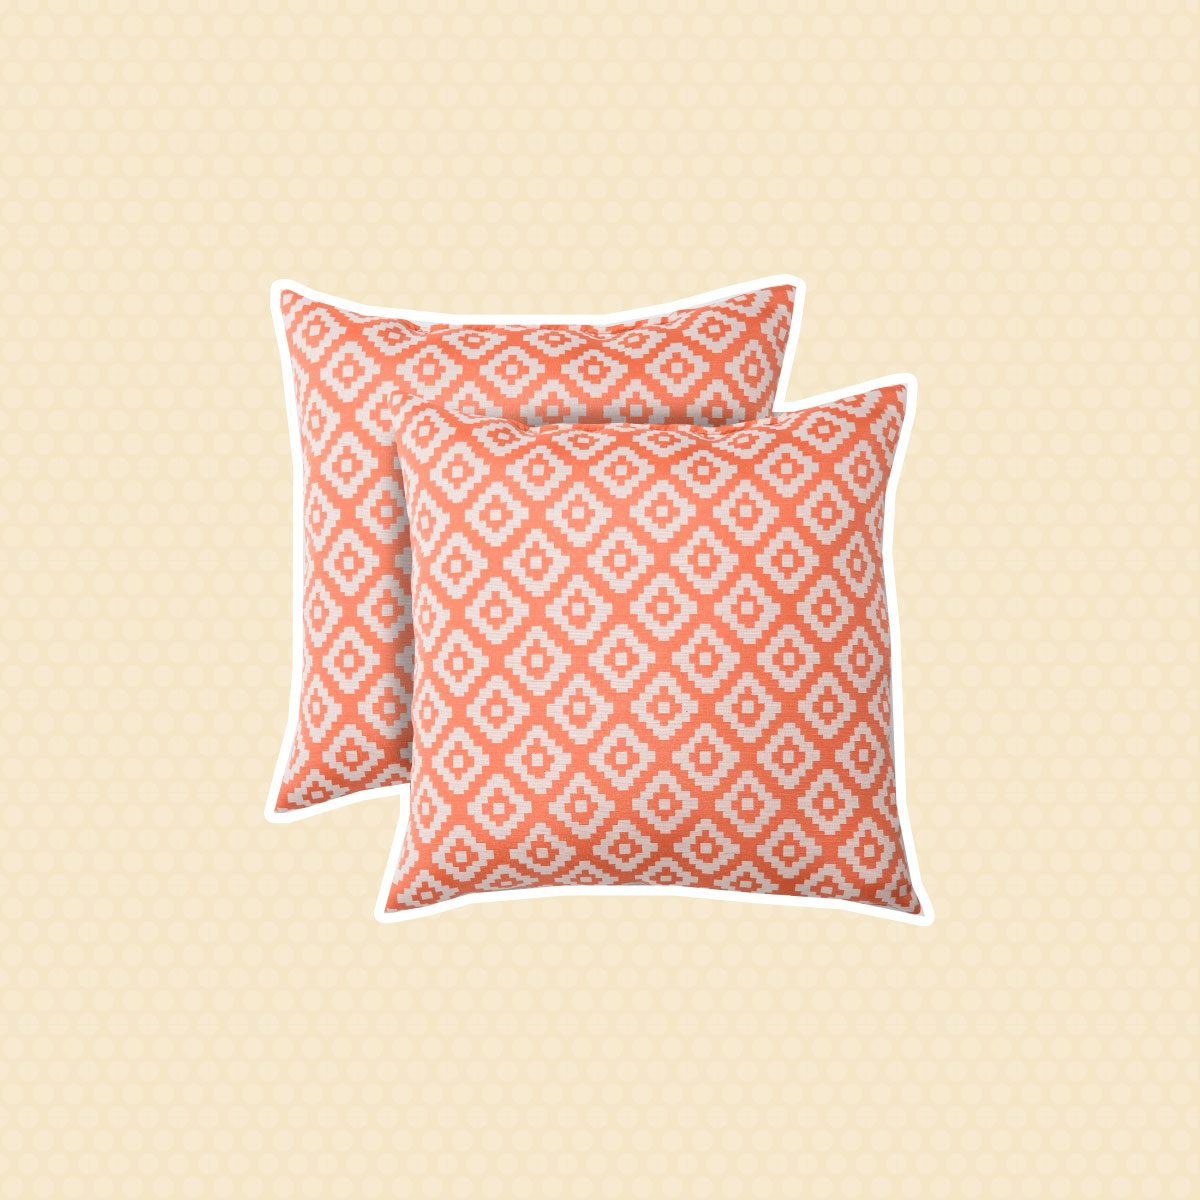 2pk Square Geo Diamond Outdoor Pillows - Threshold™